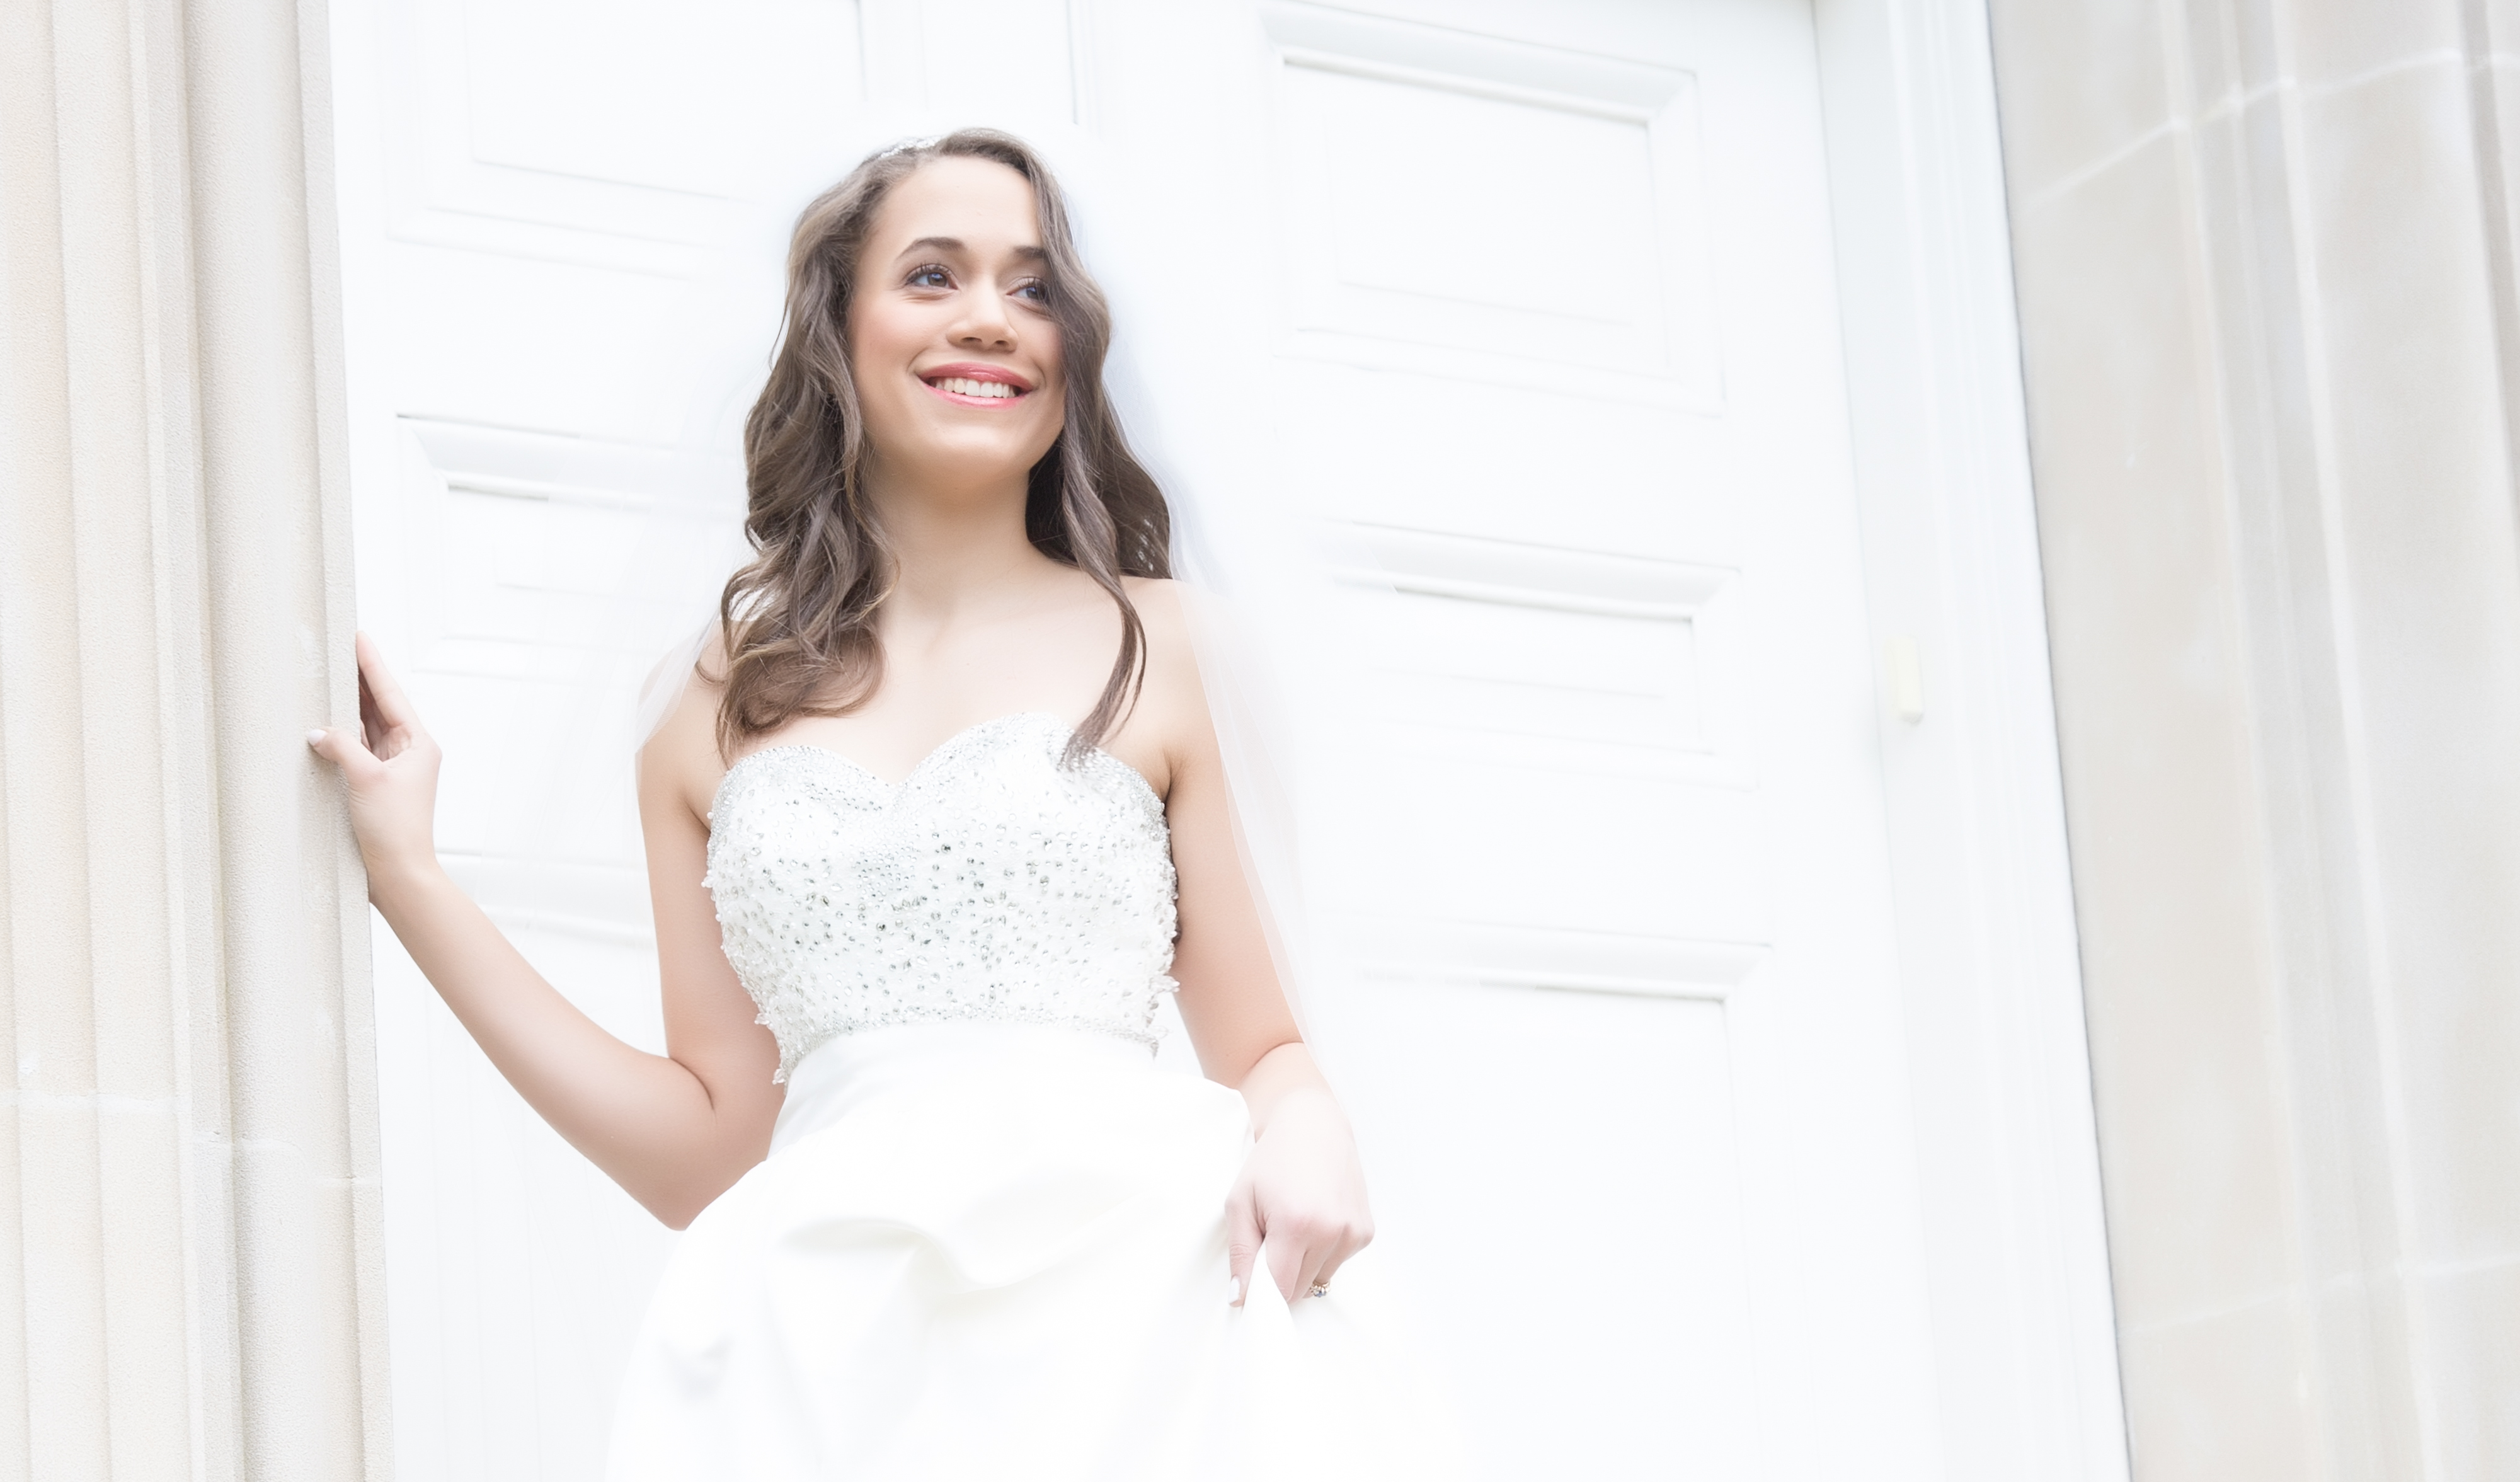 Bridal Accessories|Alterations|WashingtonDC|Green and Blue Studio